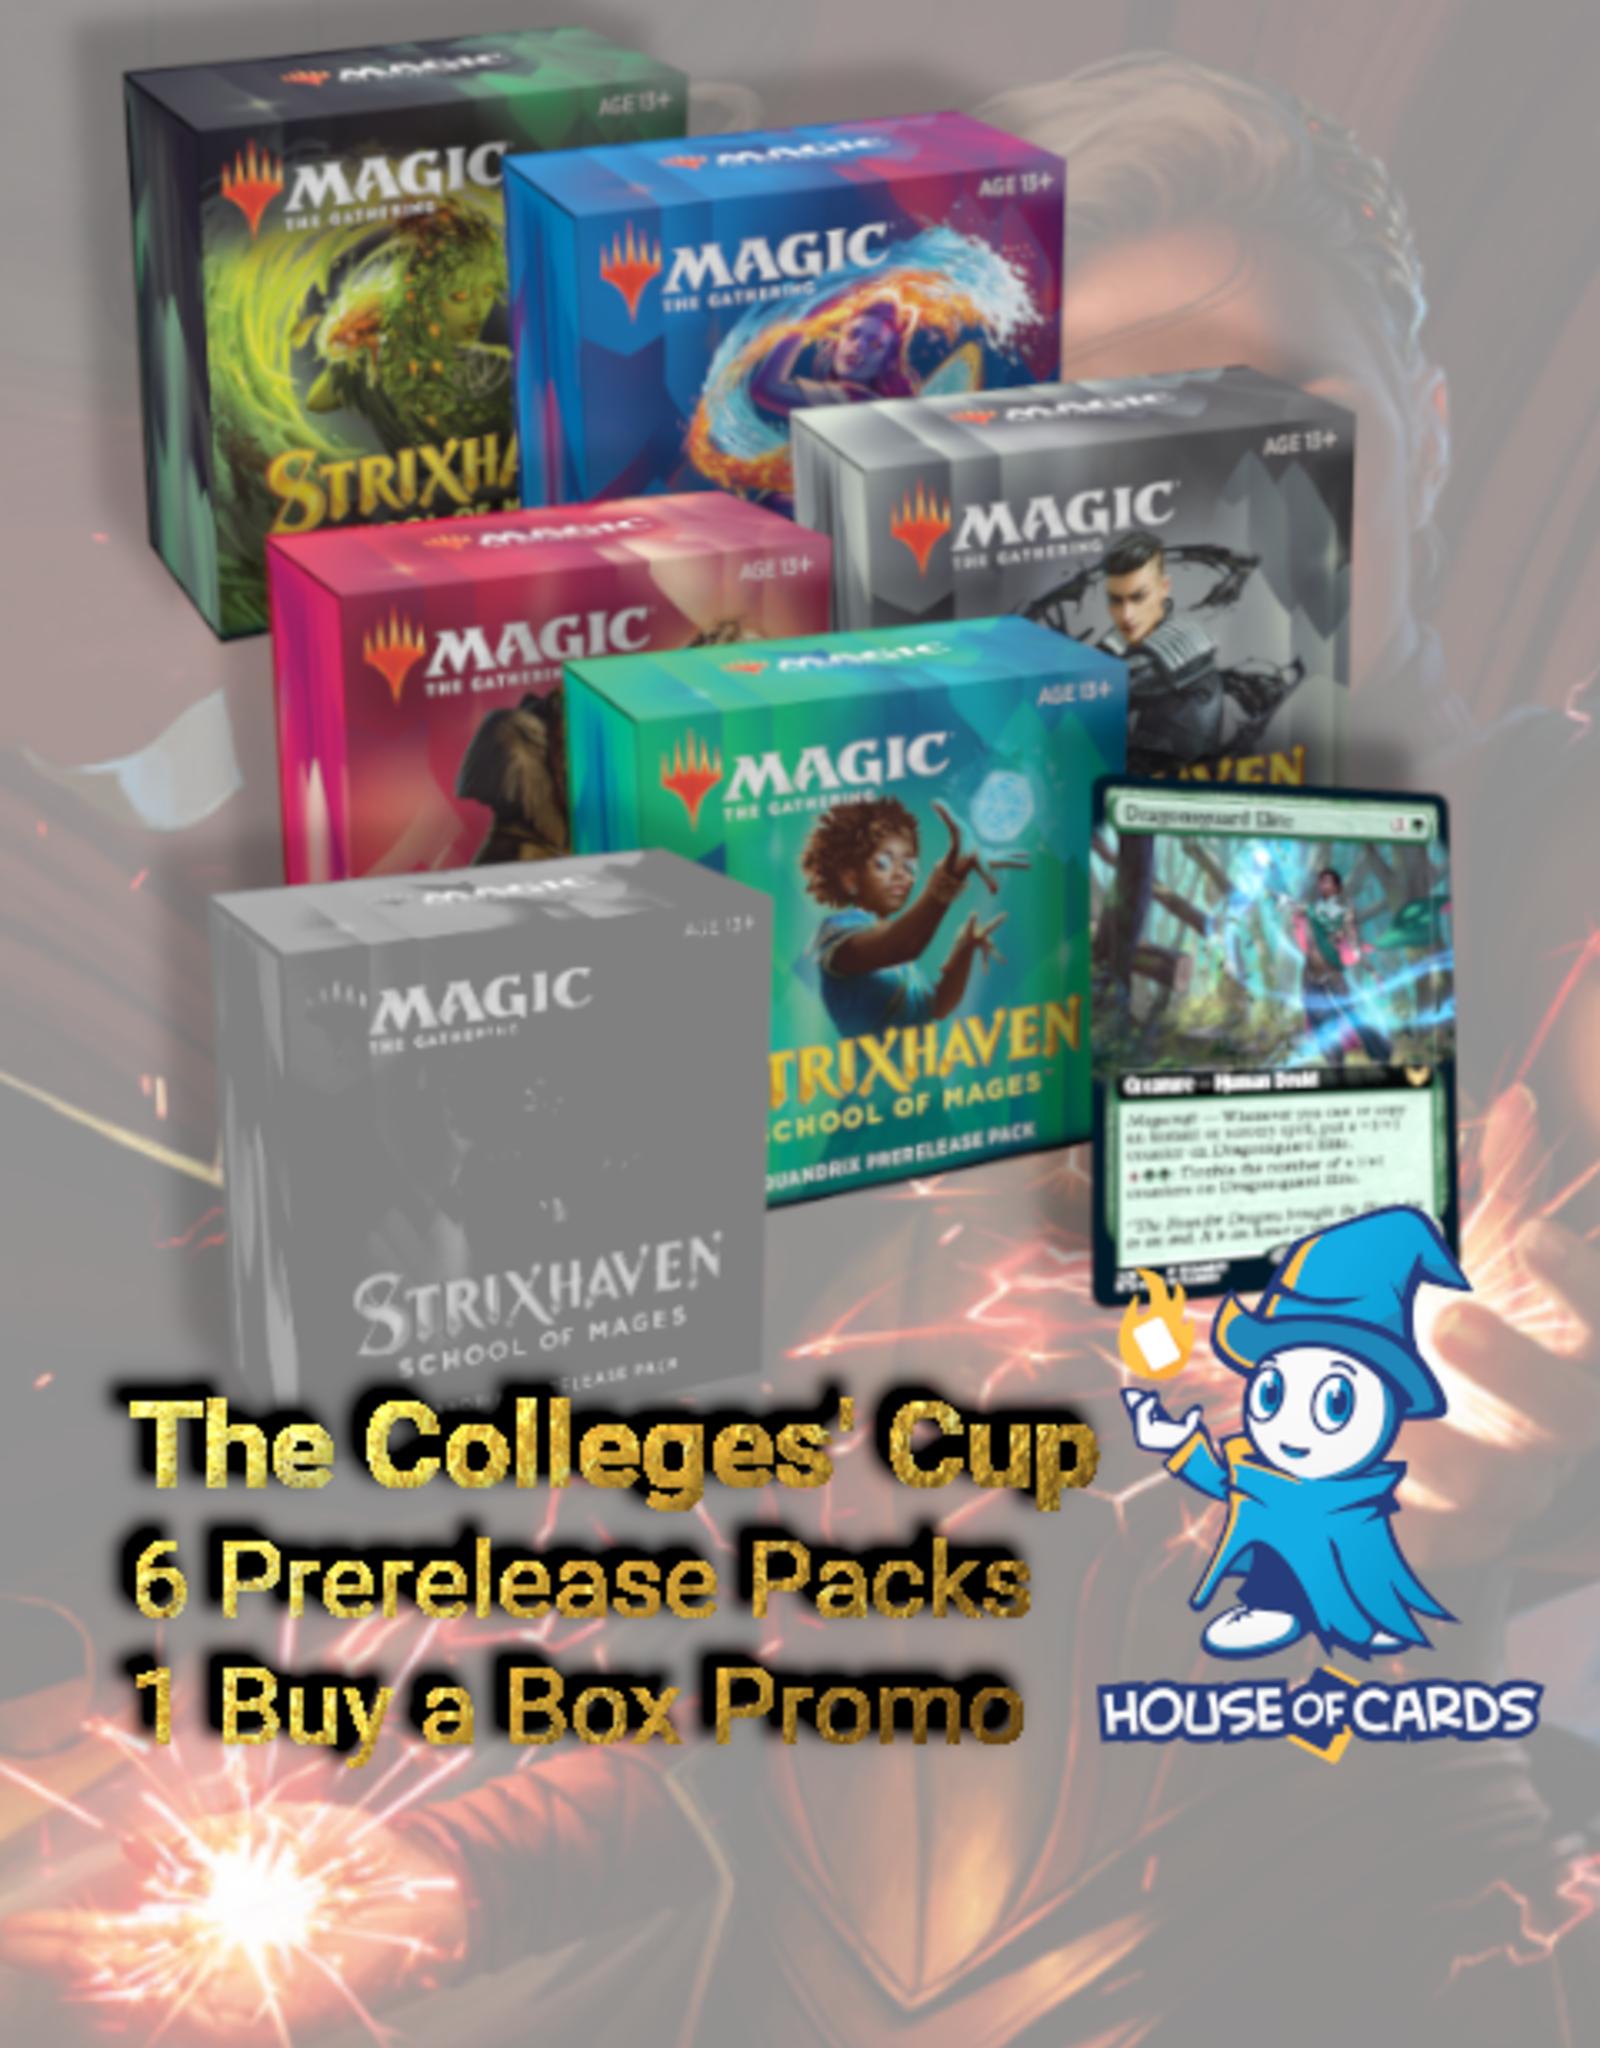 MTG - Strixhaven Strixhaven Colleges' Cup Combo - Prerelease Packs